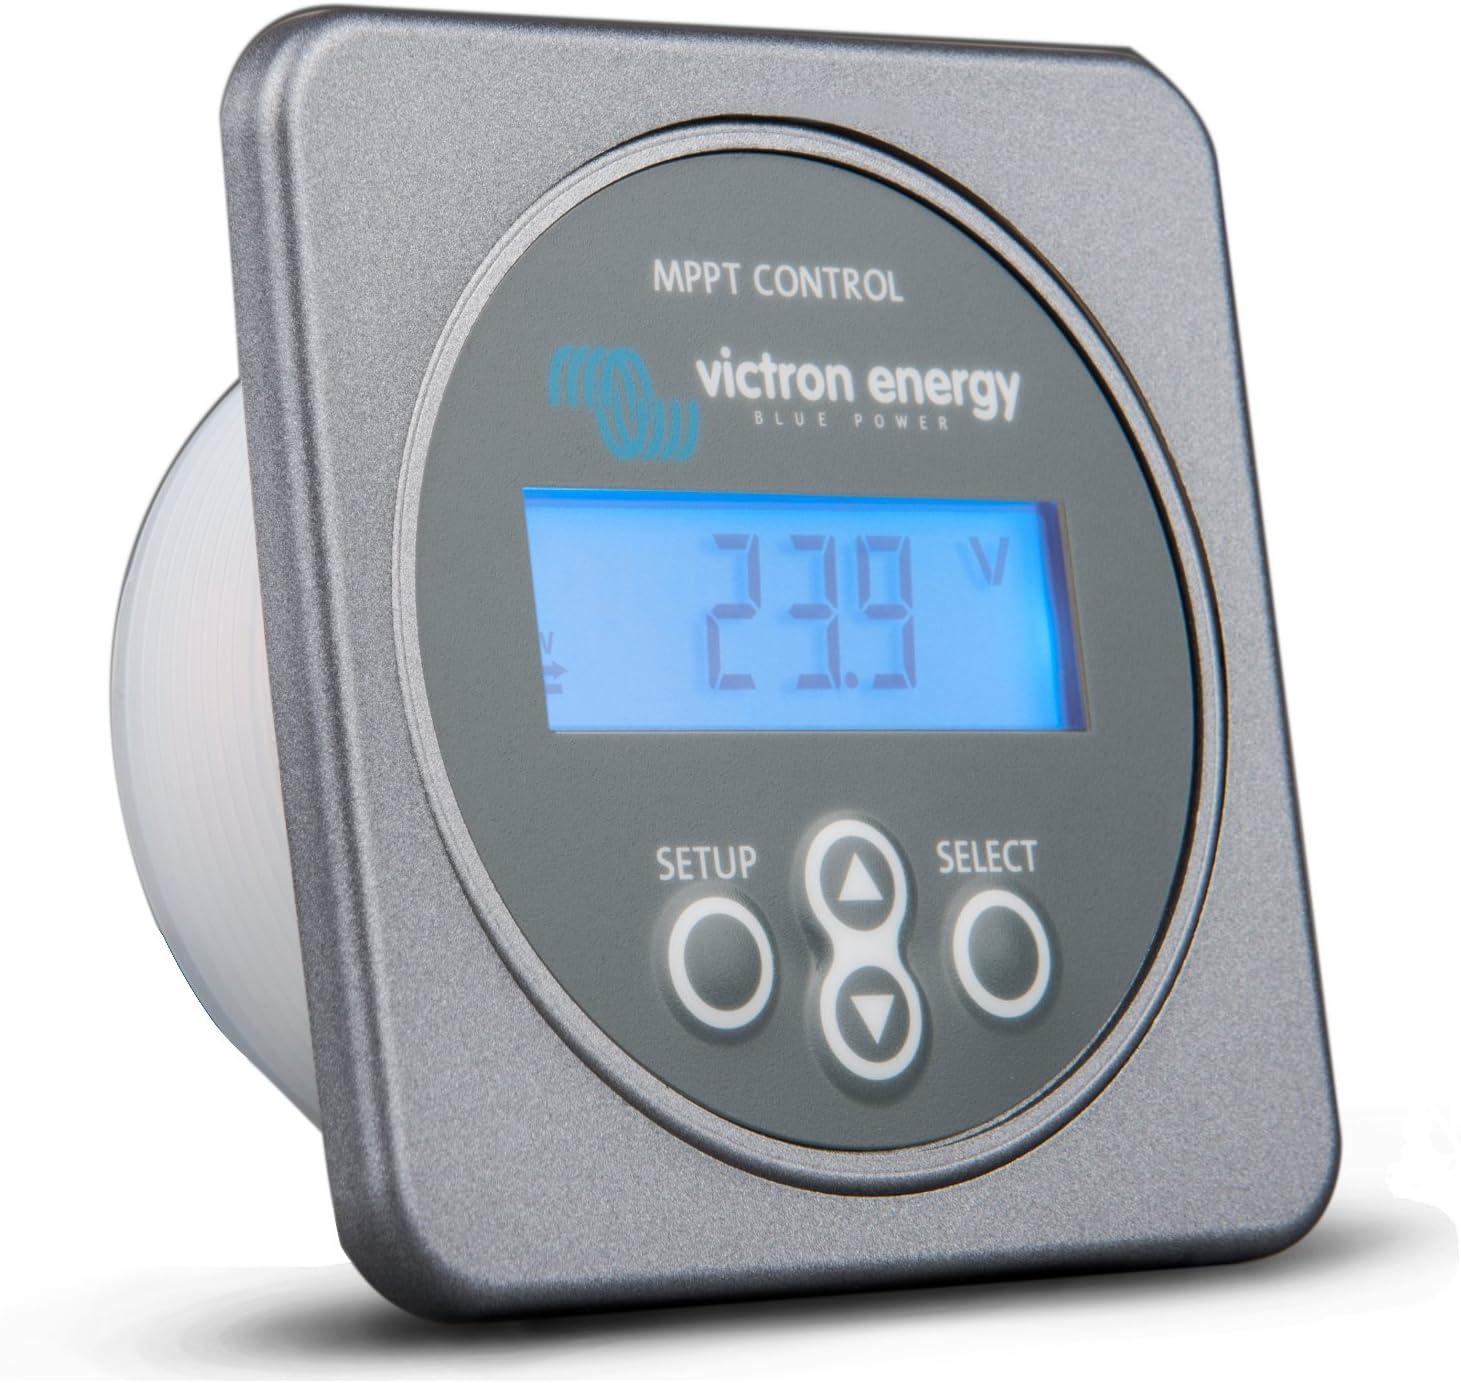 Victron ve.diretto MPPT pannello di controllo con display LCD/ /a monitor Victron Bluesolar MPPT Solar Charge controller